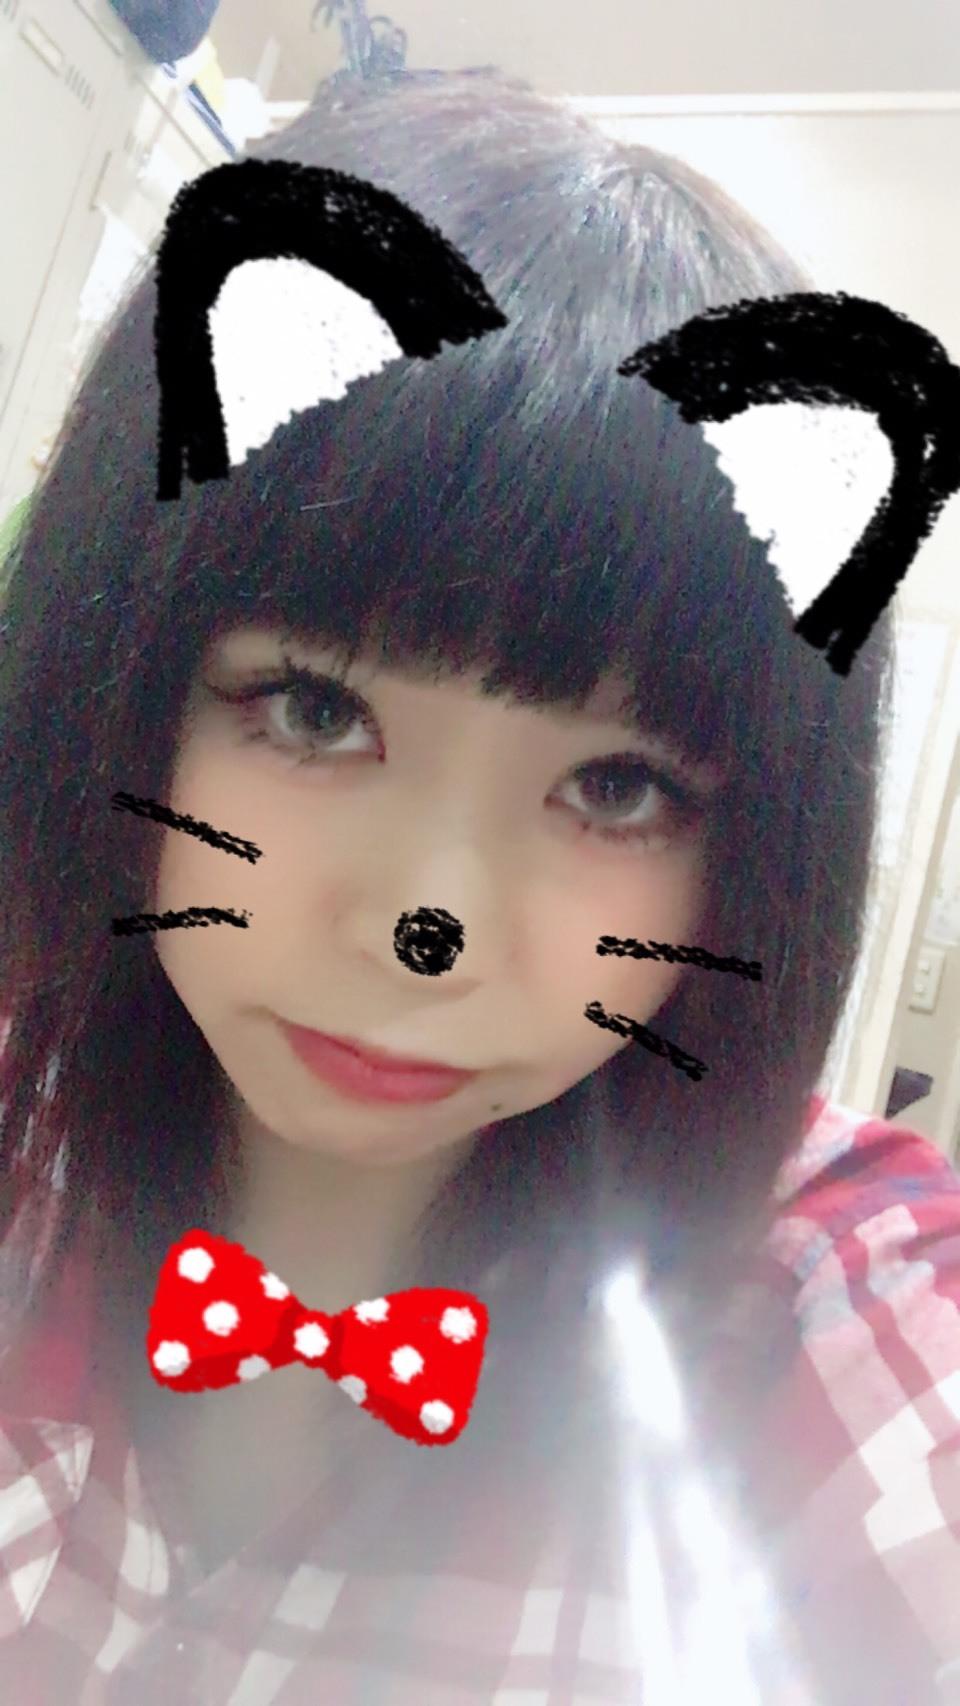 S__15663170.jpg